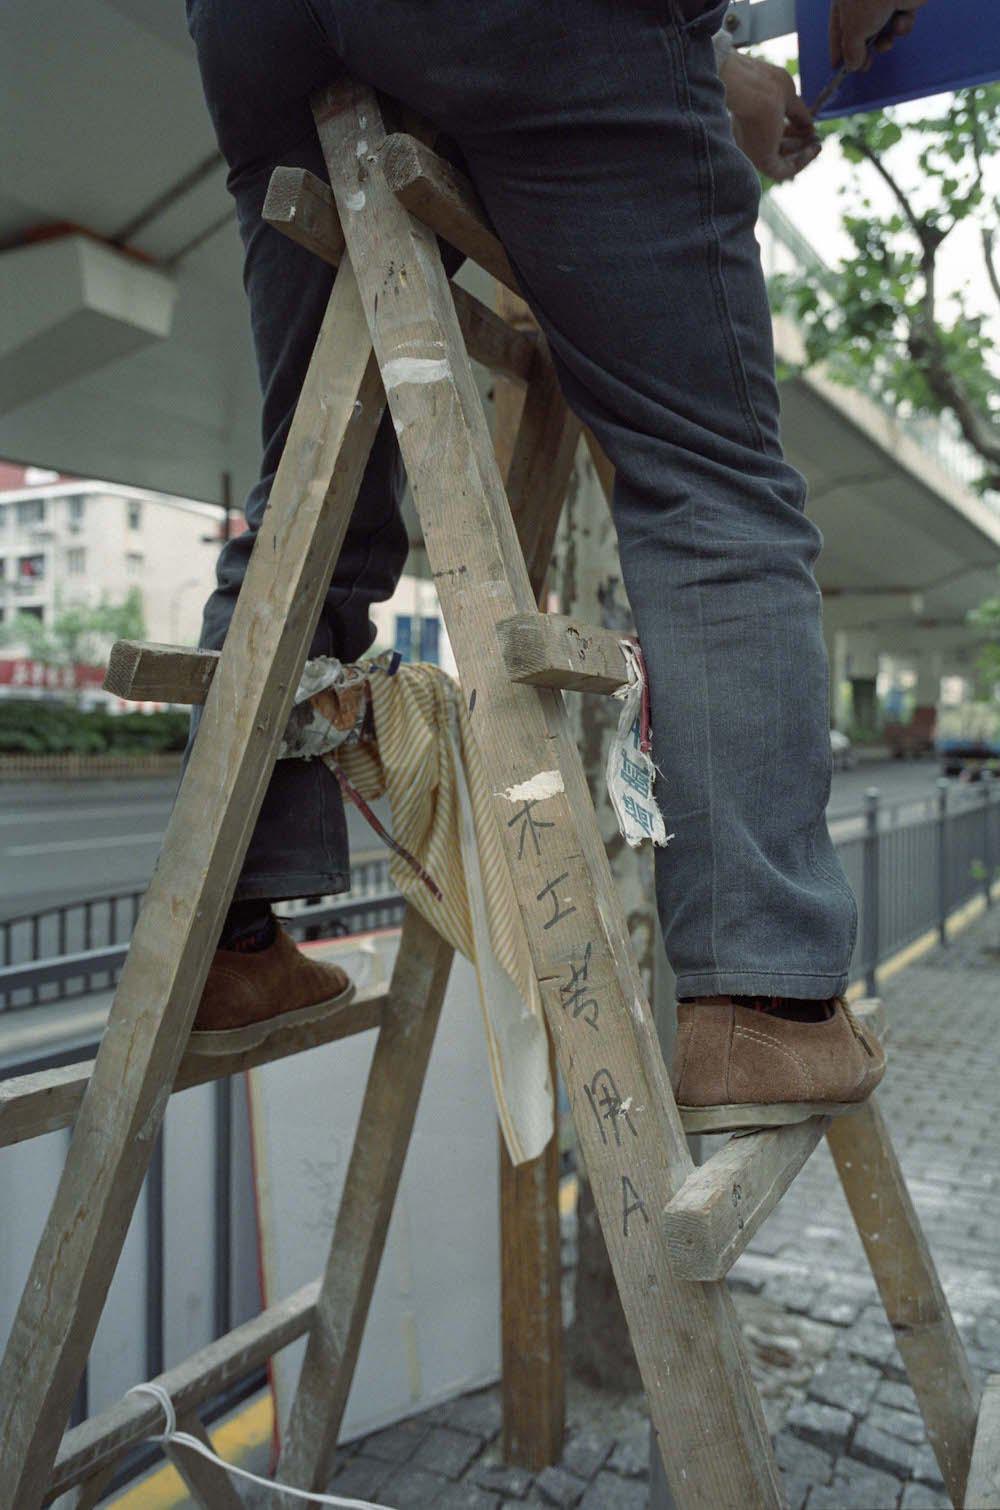 duran-levinson-shanghai-photography-4.jpg